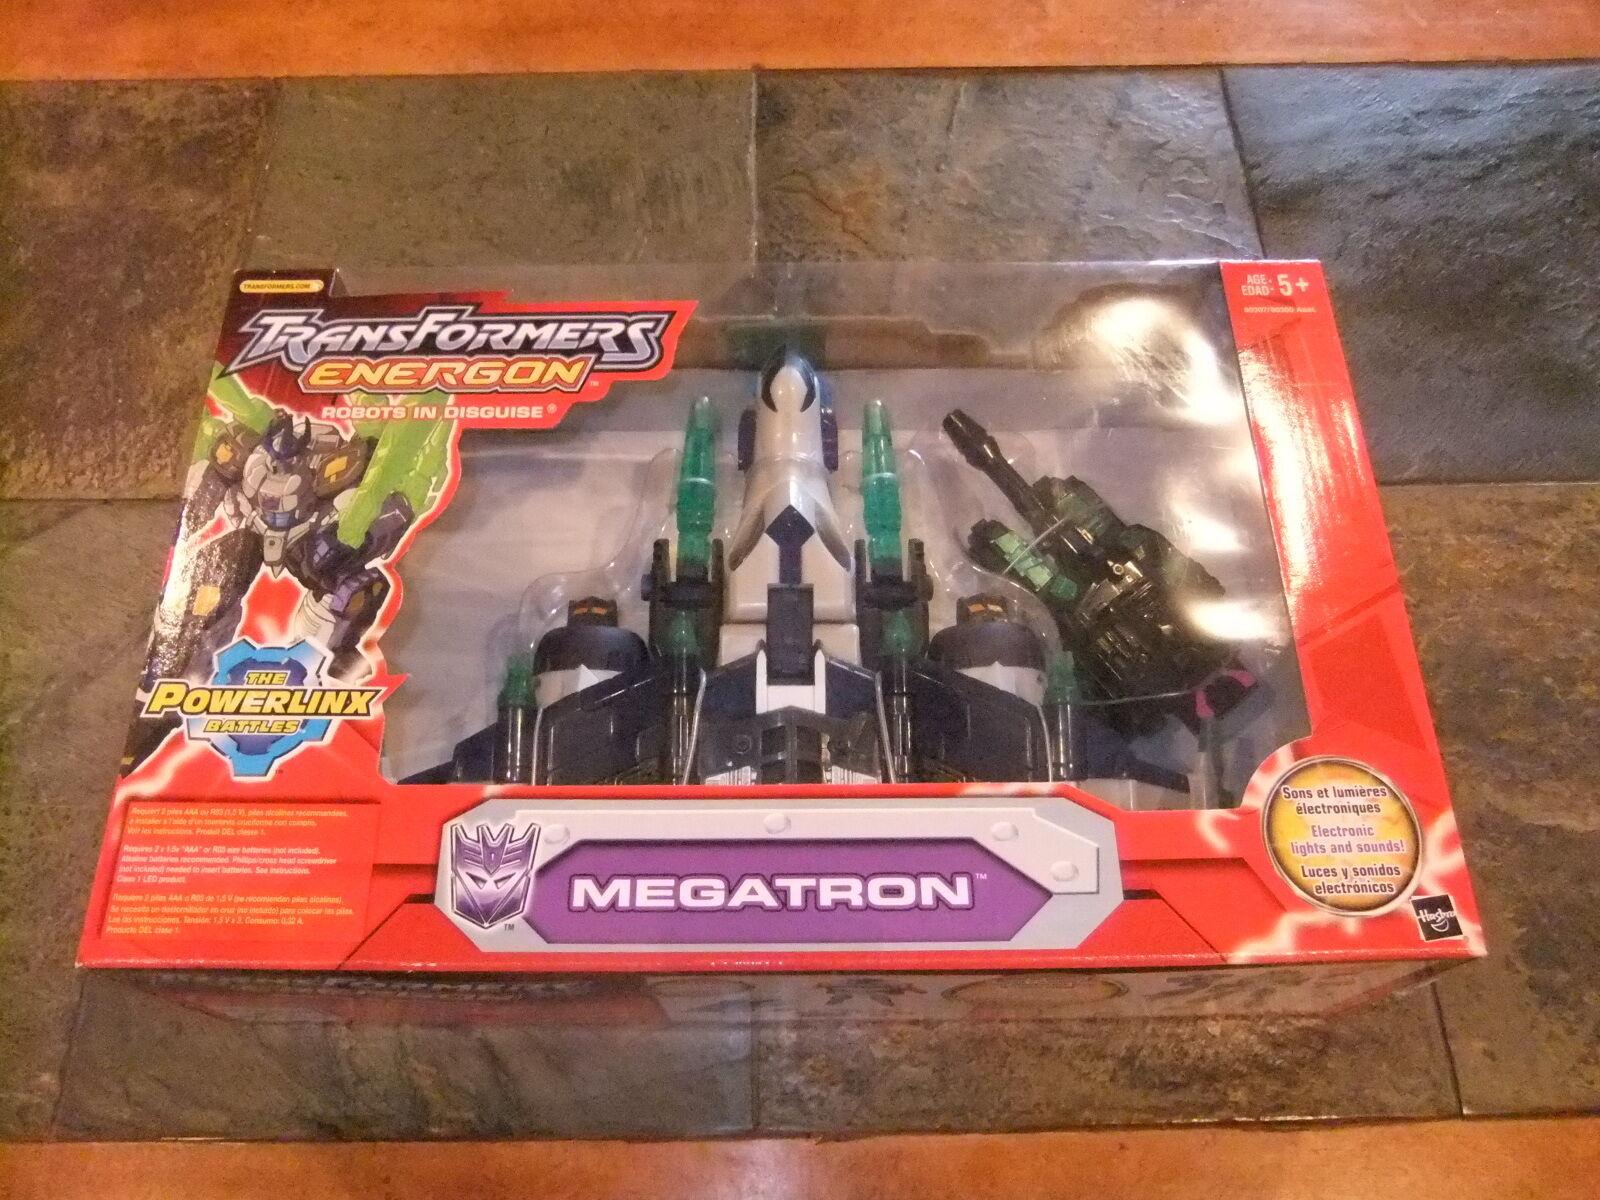 Transformers Action Figure Leader Class Energon Megatron 2003 Red version MISB